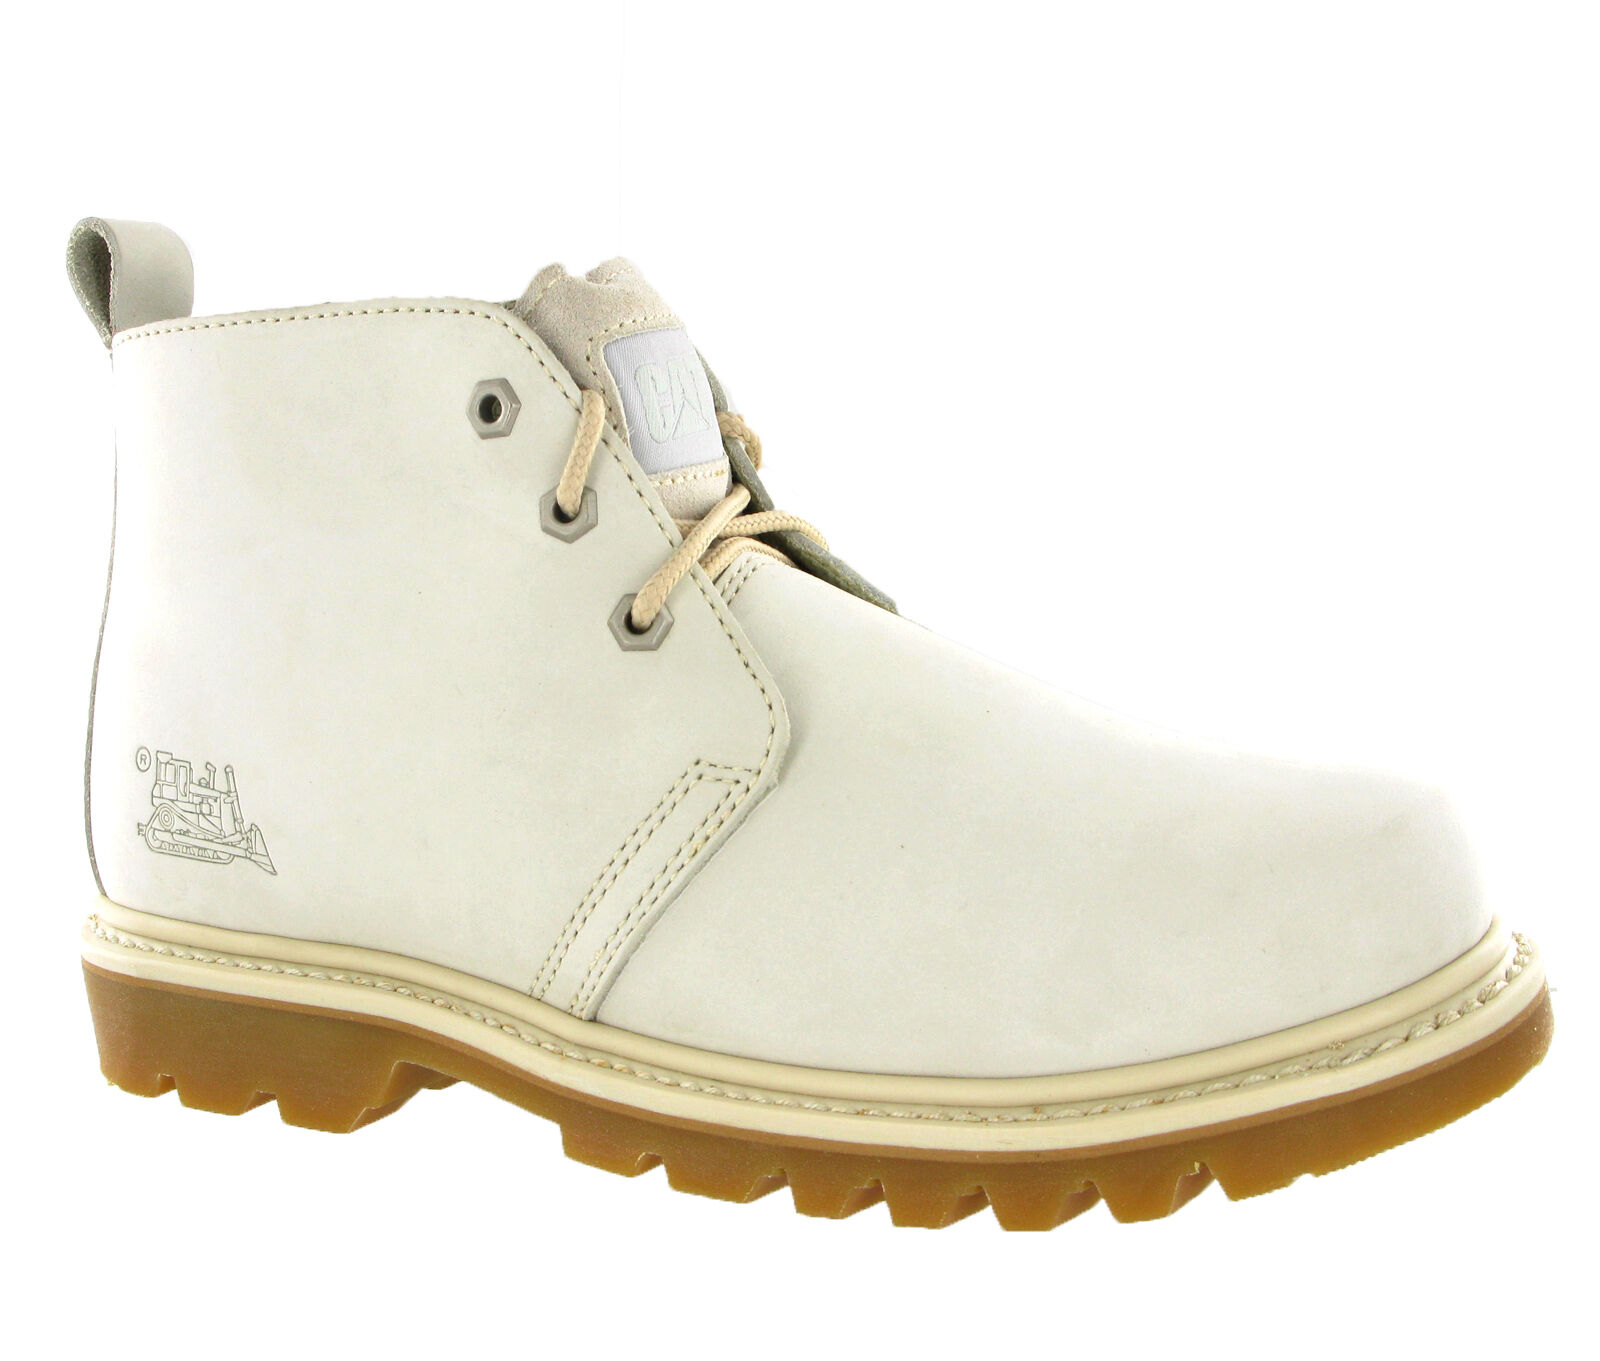 Cat Caterpillar Mandy Tapa blancoa Chukka Tobillo Caminar botas para Dama Talla